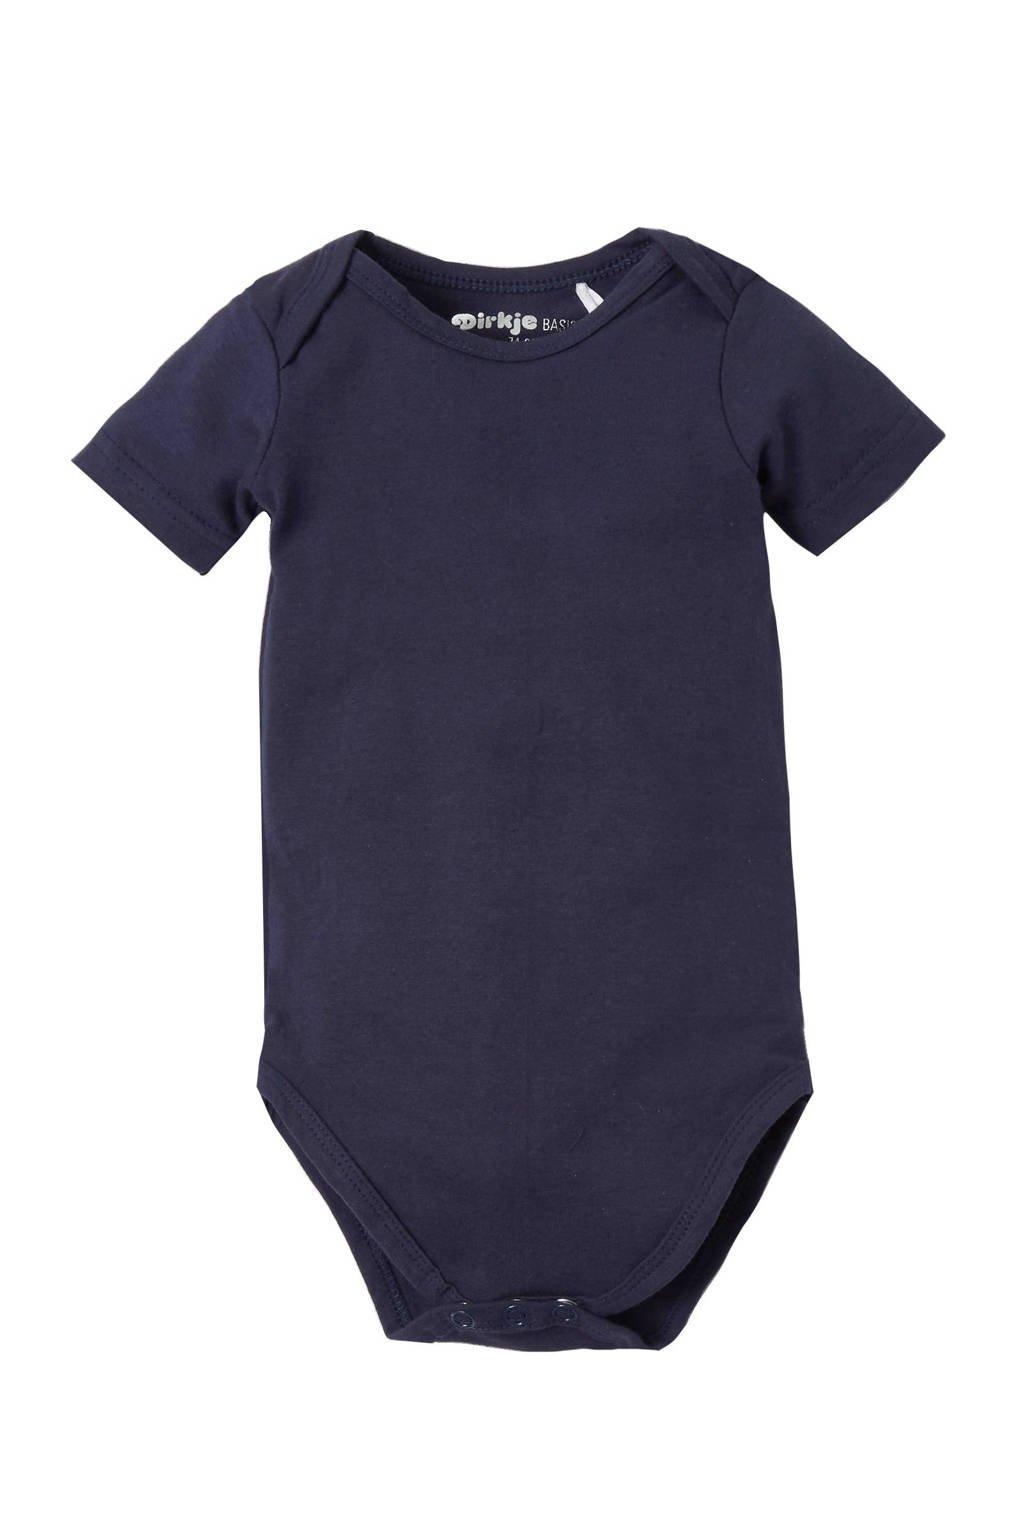 Dirkje newborn baby romper, Donkerblauw, Kort